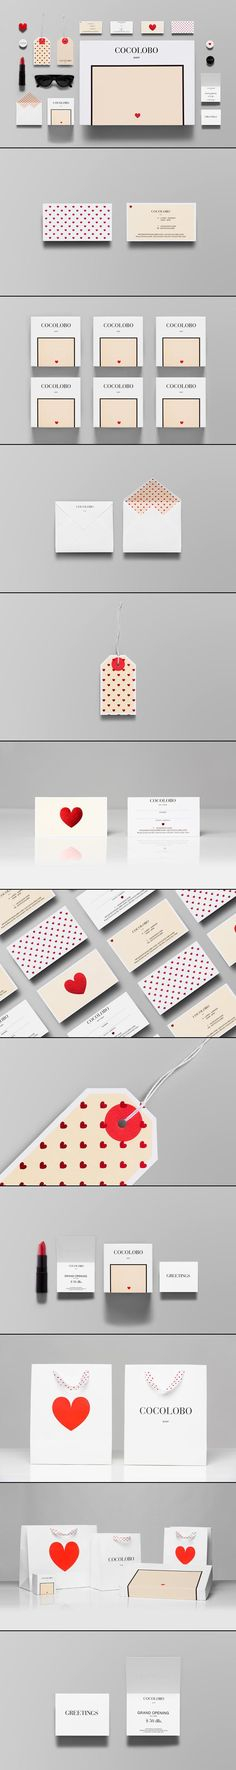 Sweet Cocolobo #identity #packaging #branding PD